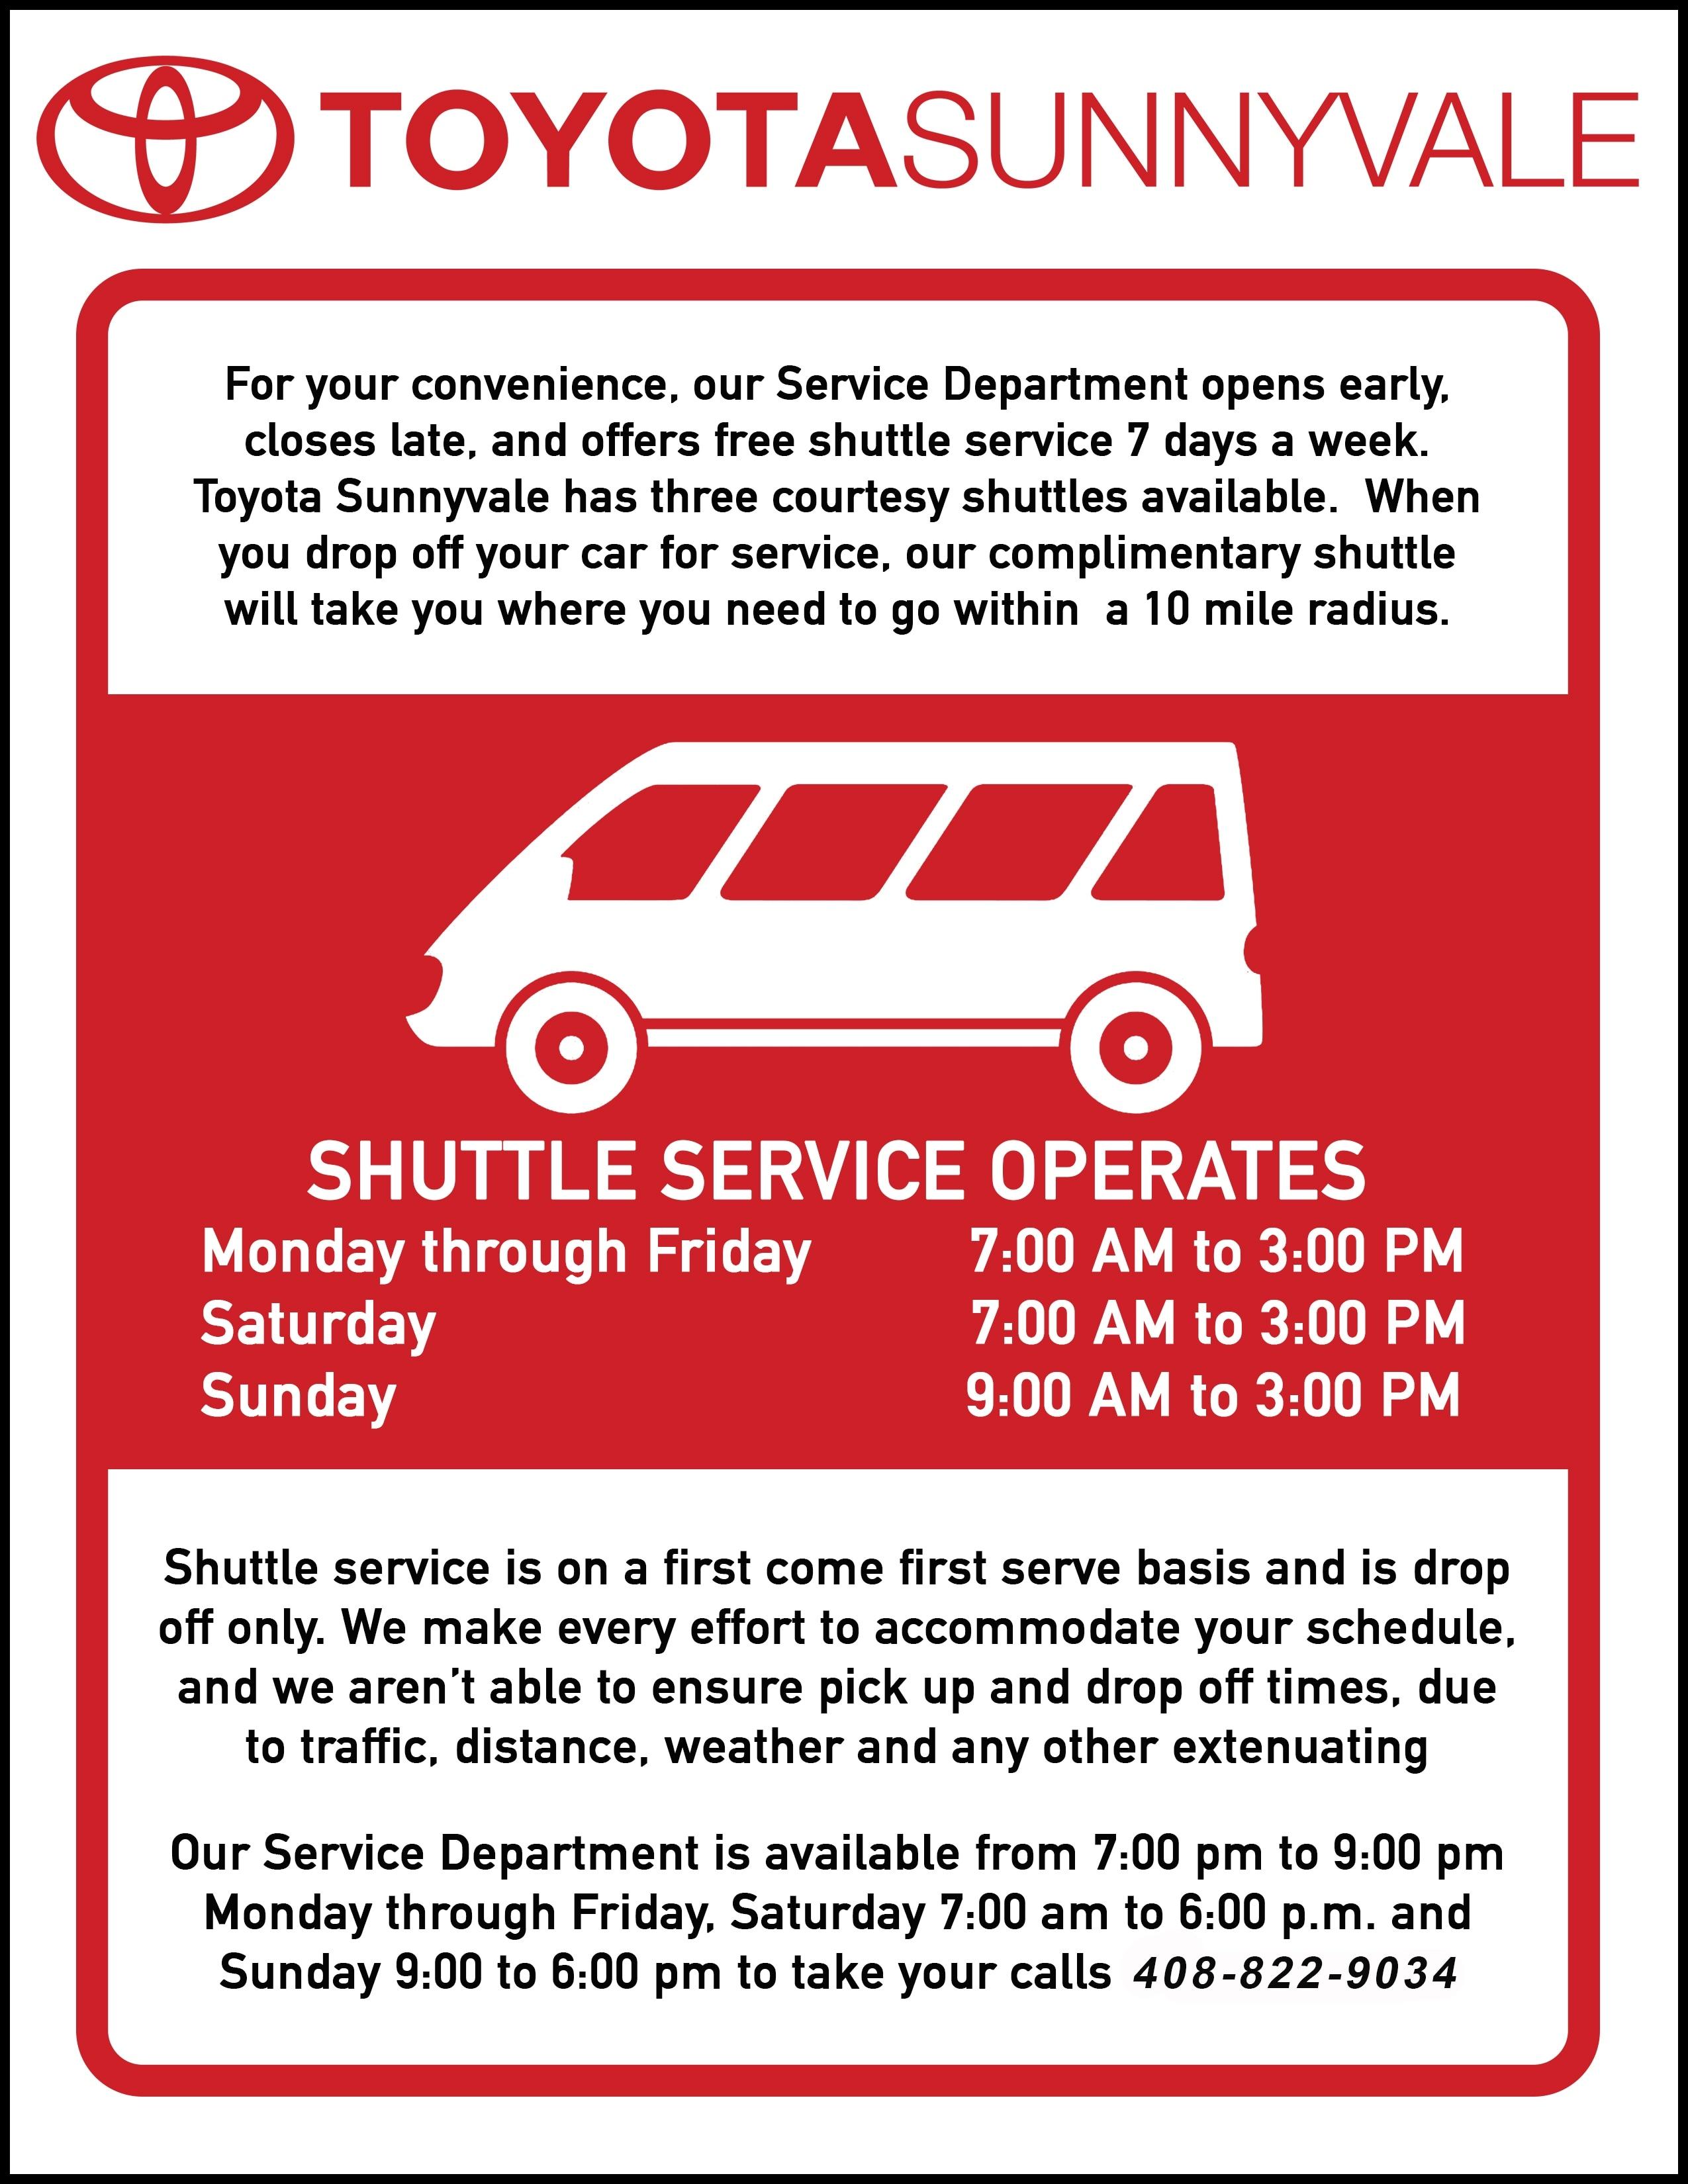 Contact Toyota Sunnyvale